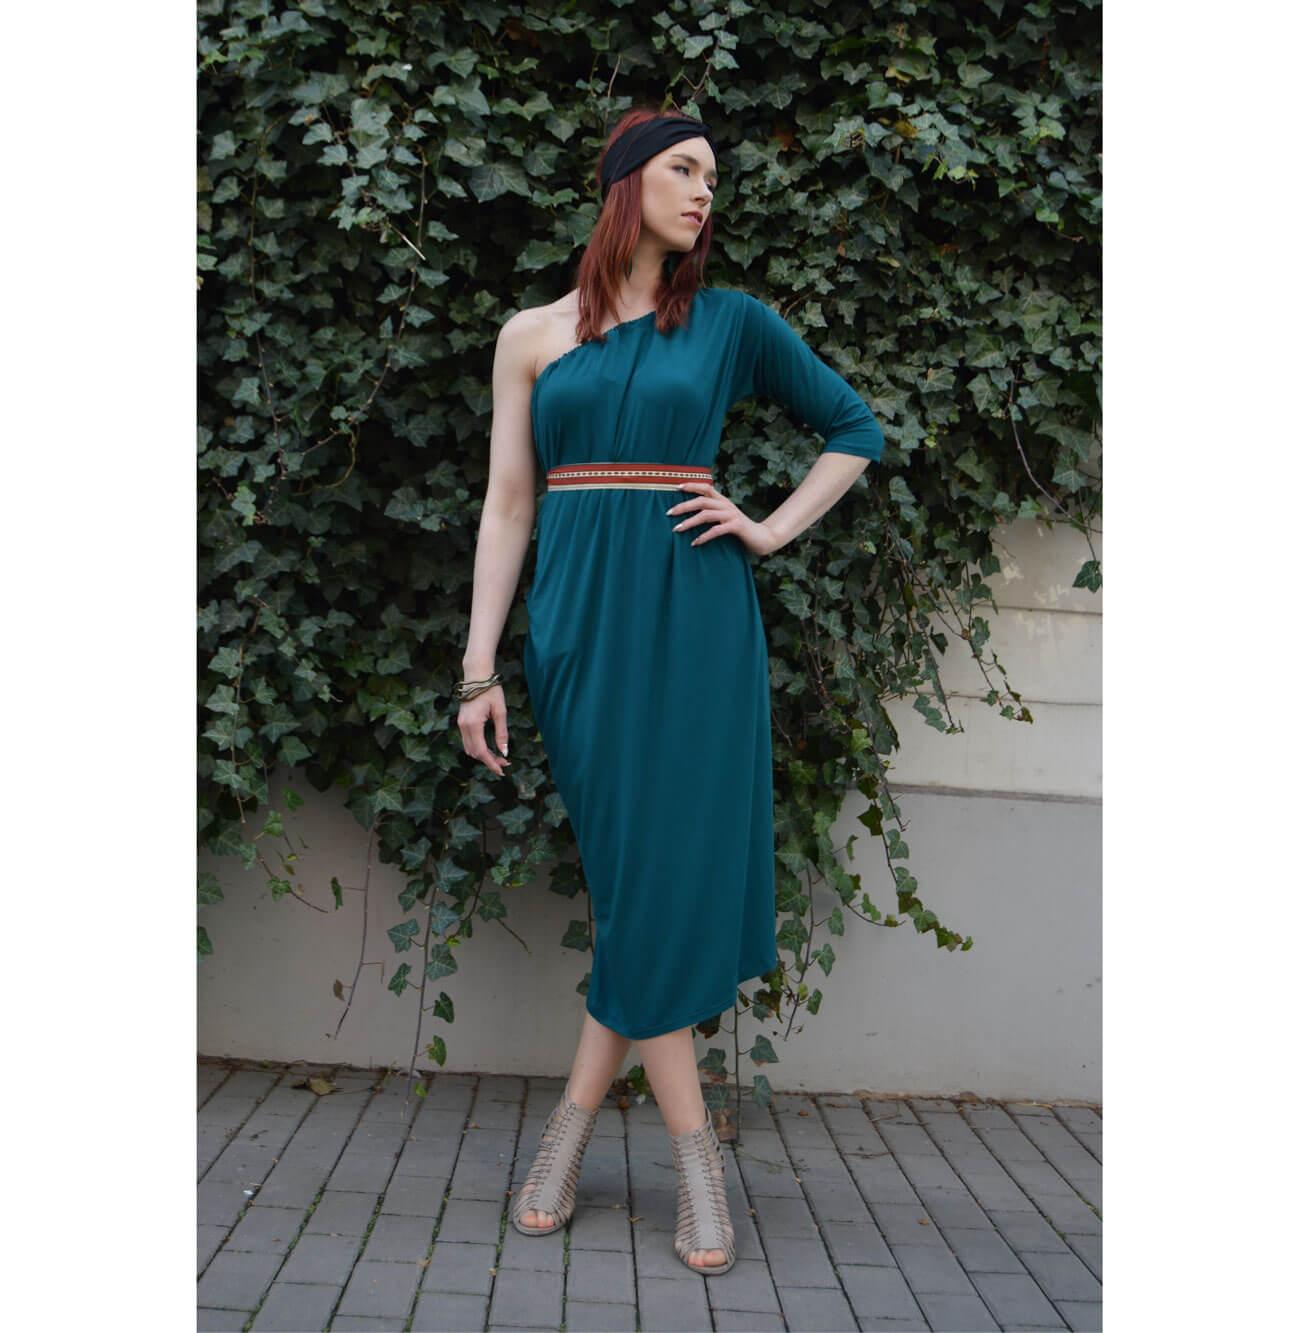 Emerald one sleeve slow fashion dress Prague